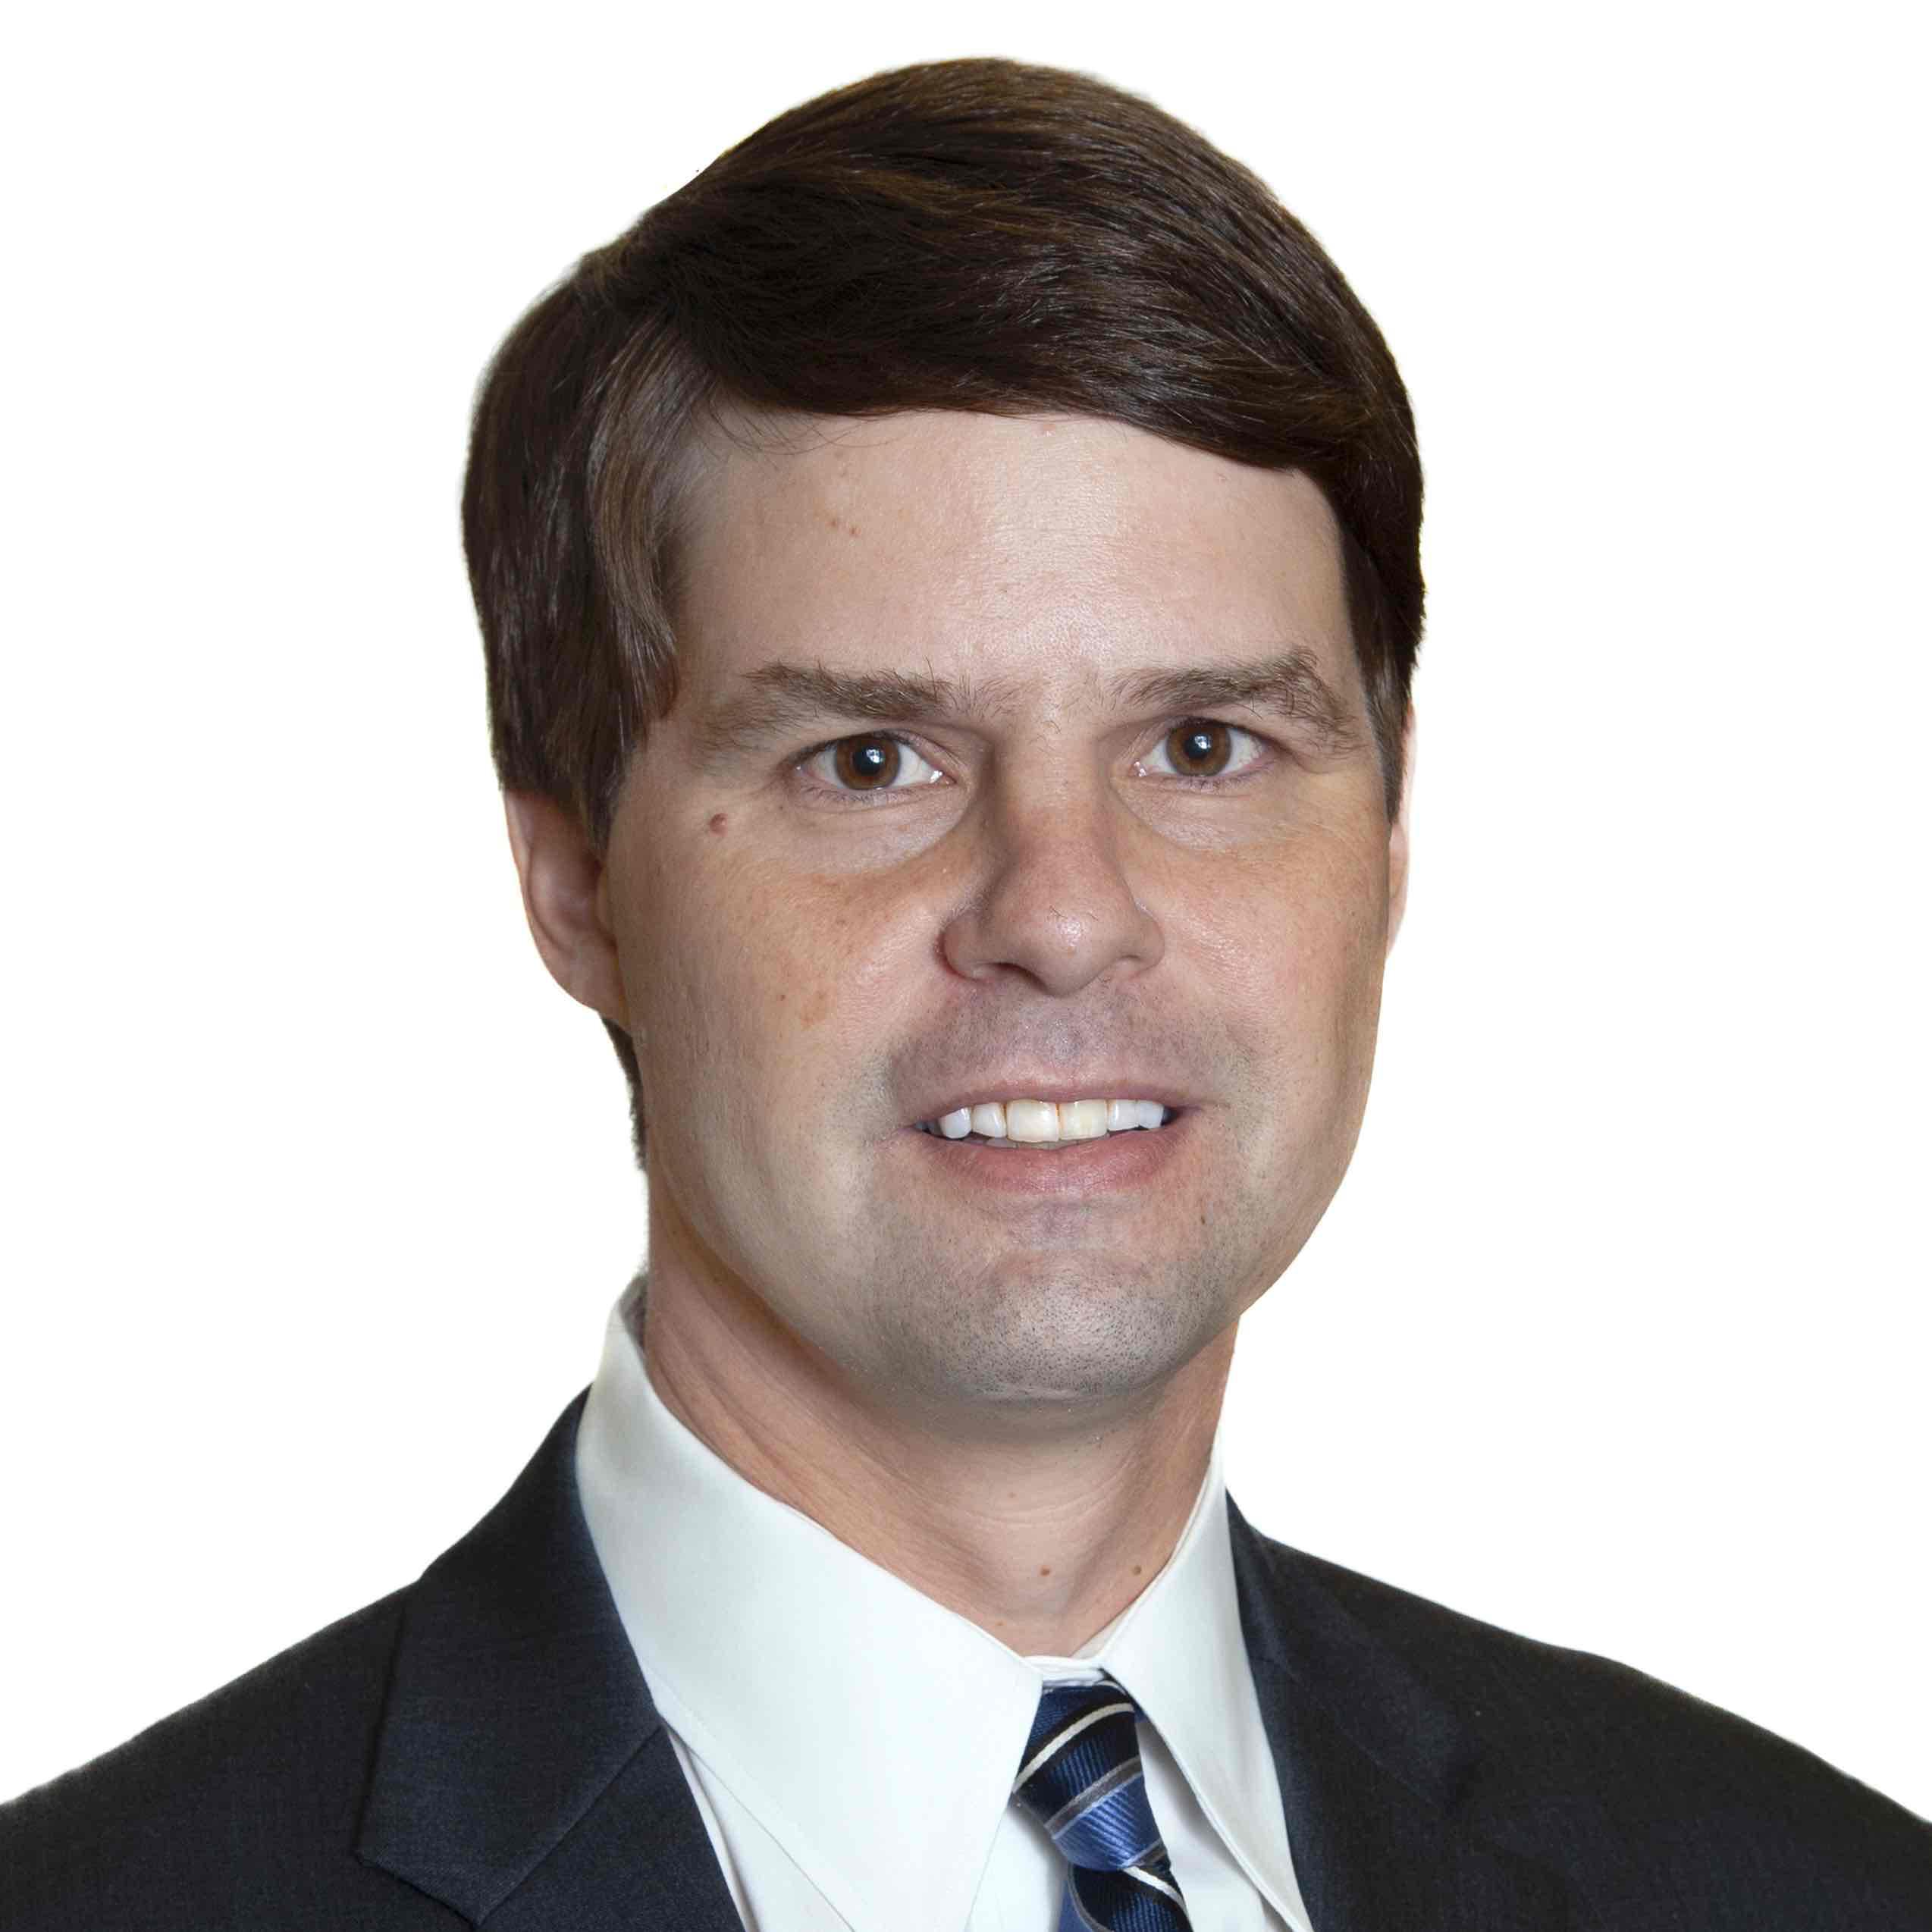 A photo of Partner, Alex Sanders, Bankruptcy Lawyer